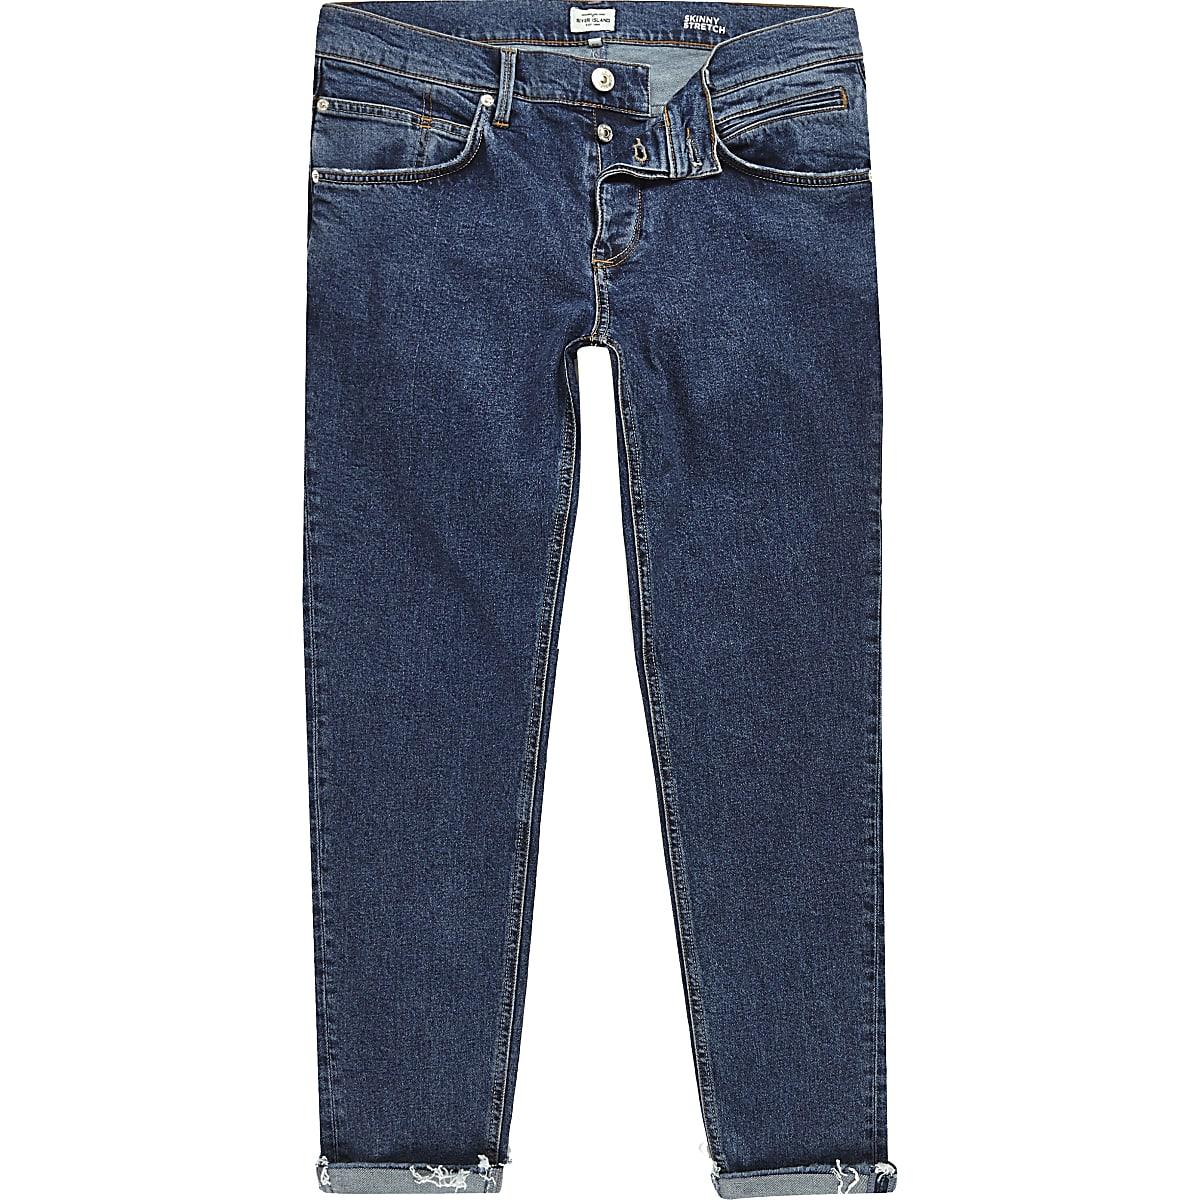 Blue Sid cropped skinny jeans